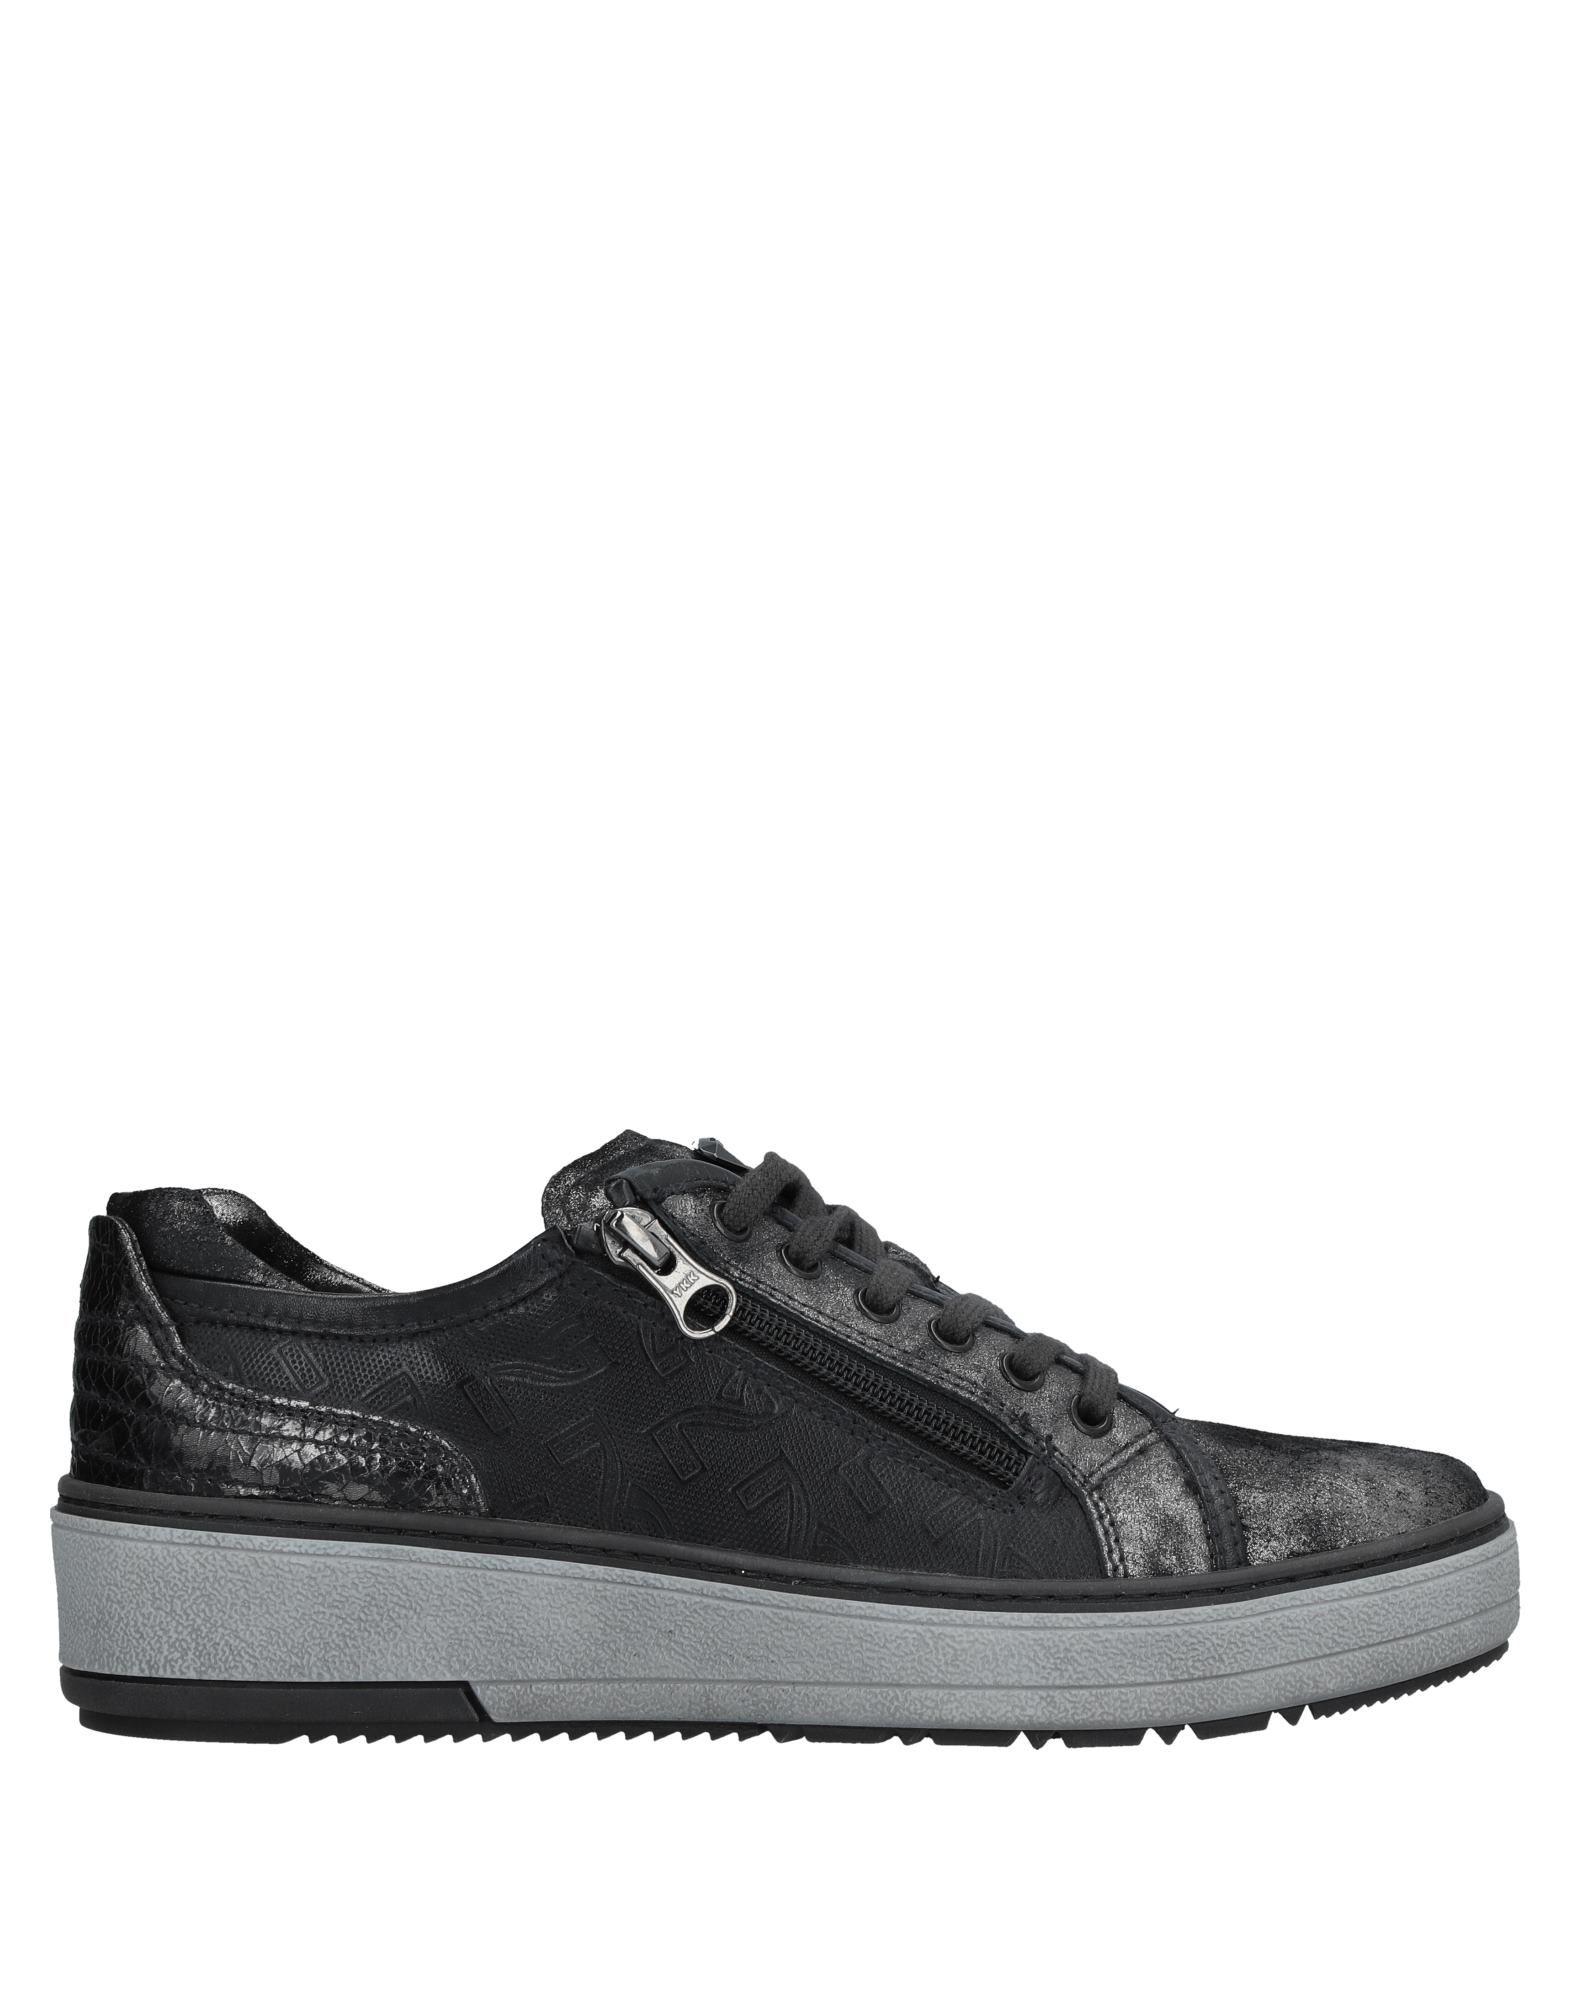 Nero Giardini Sneakers Damen    11497655PT Gute Qualität beliebte Schuhe de809c